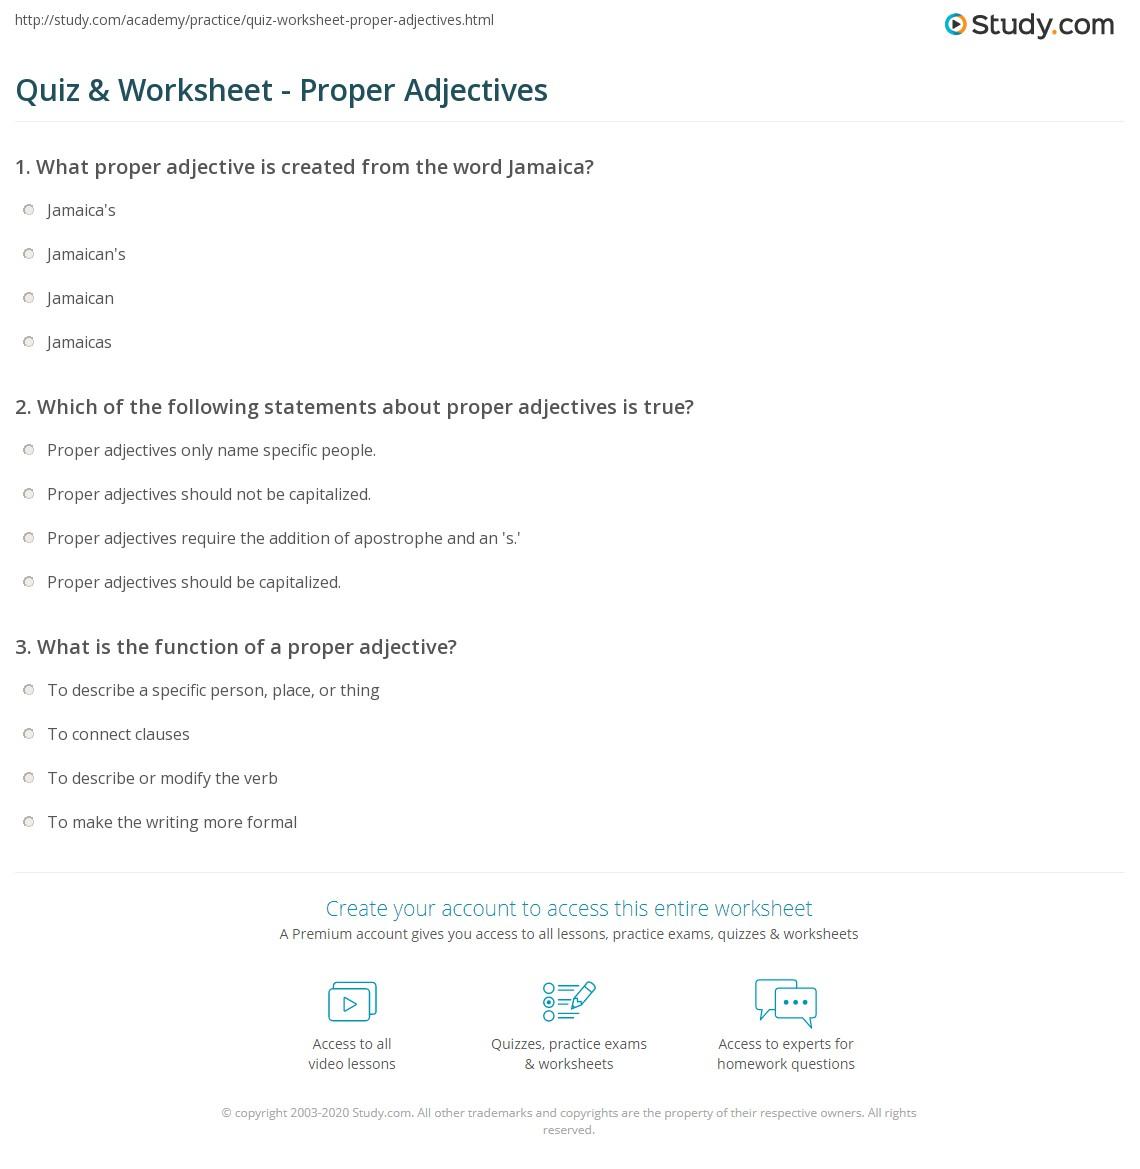 Quiz & Worksheet Proper Adjectives